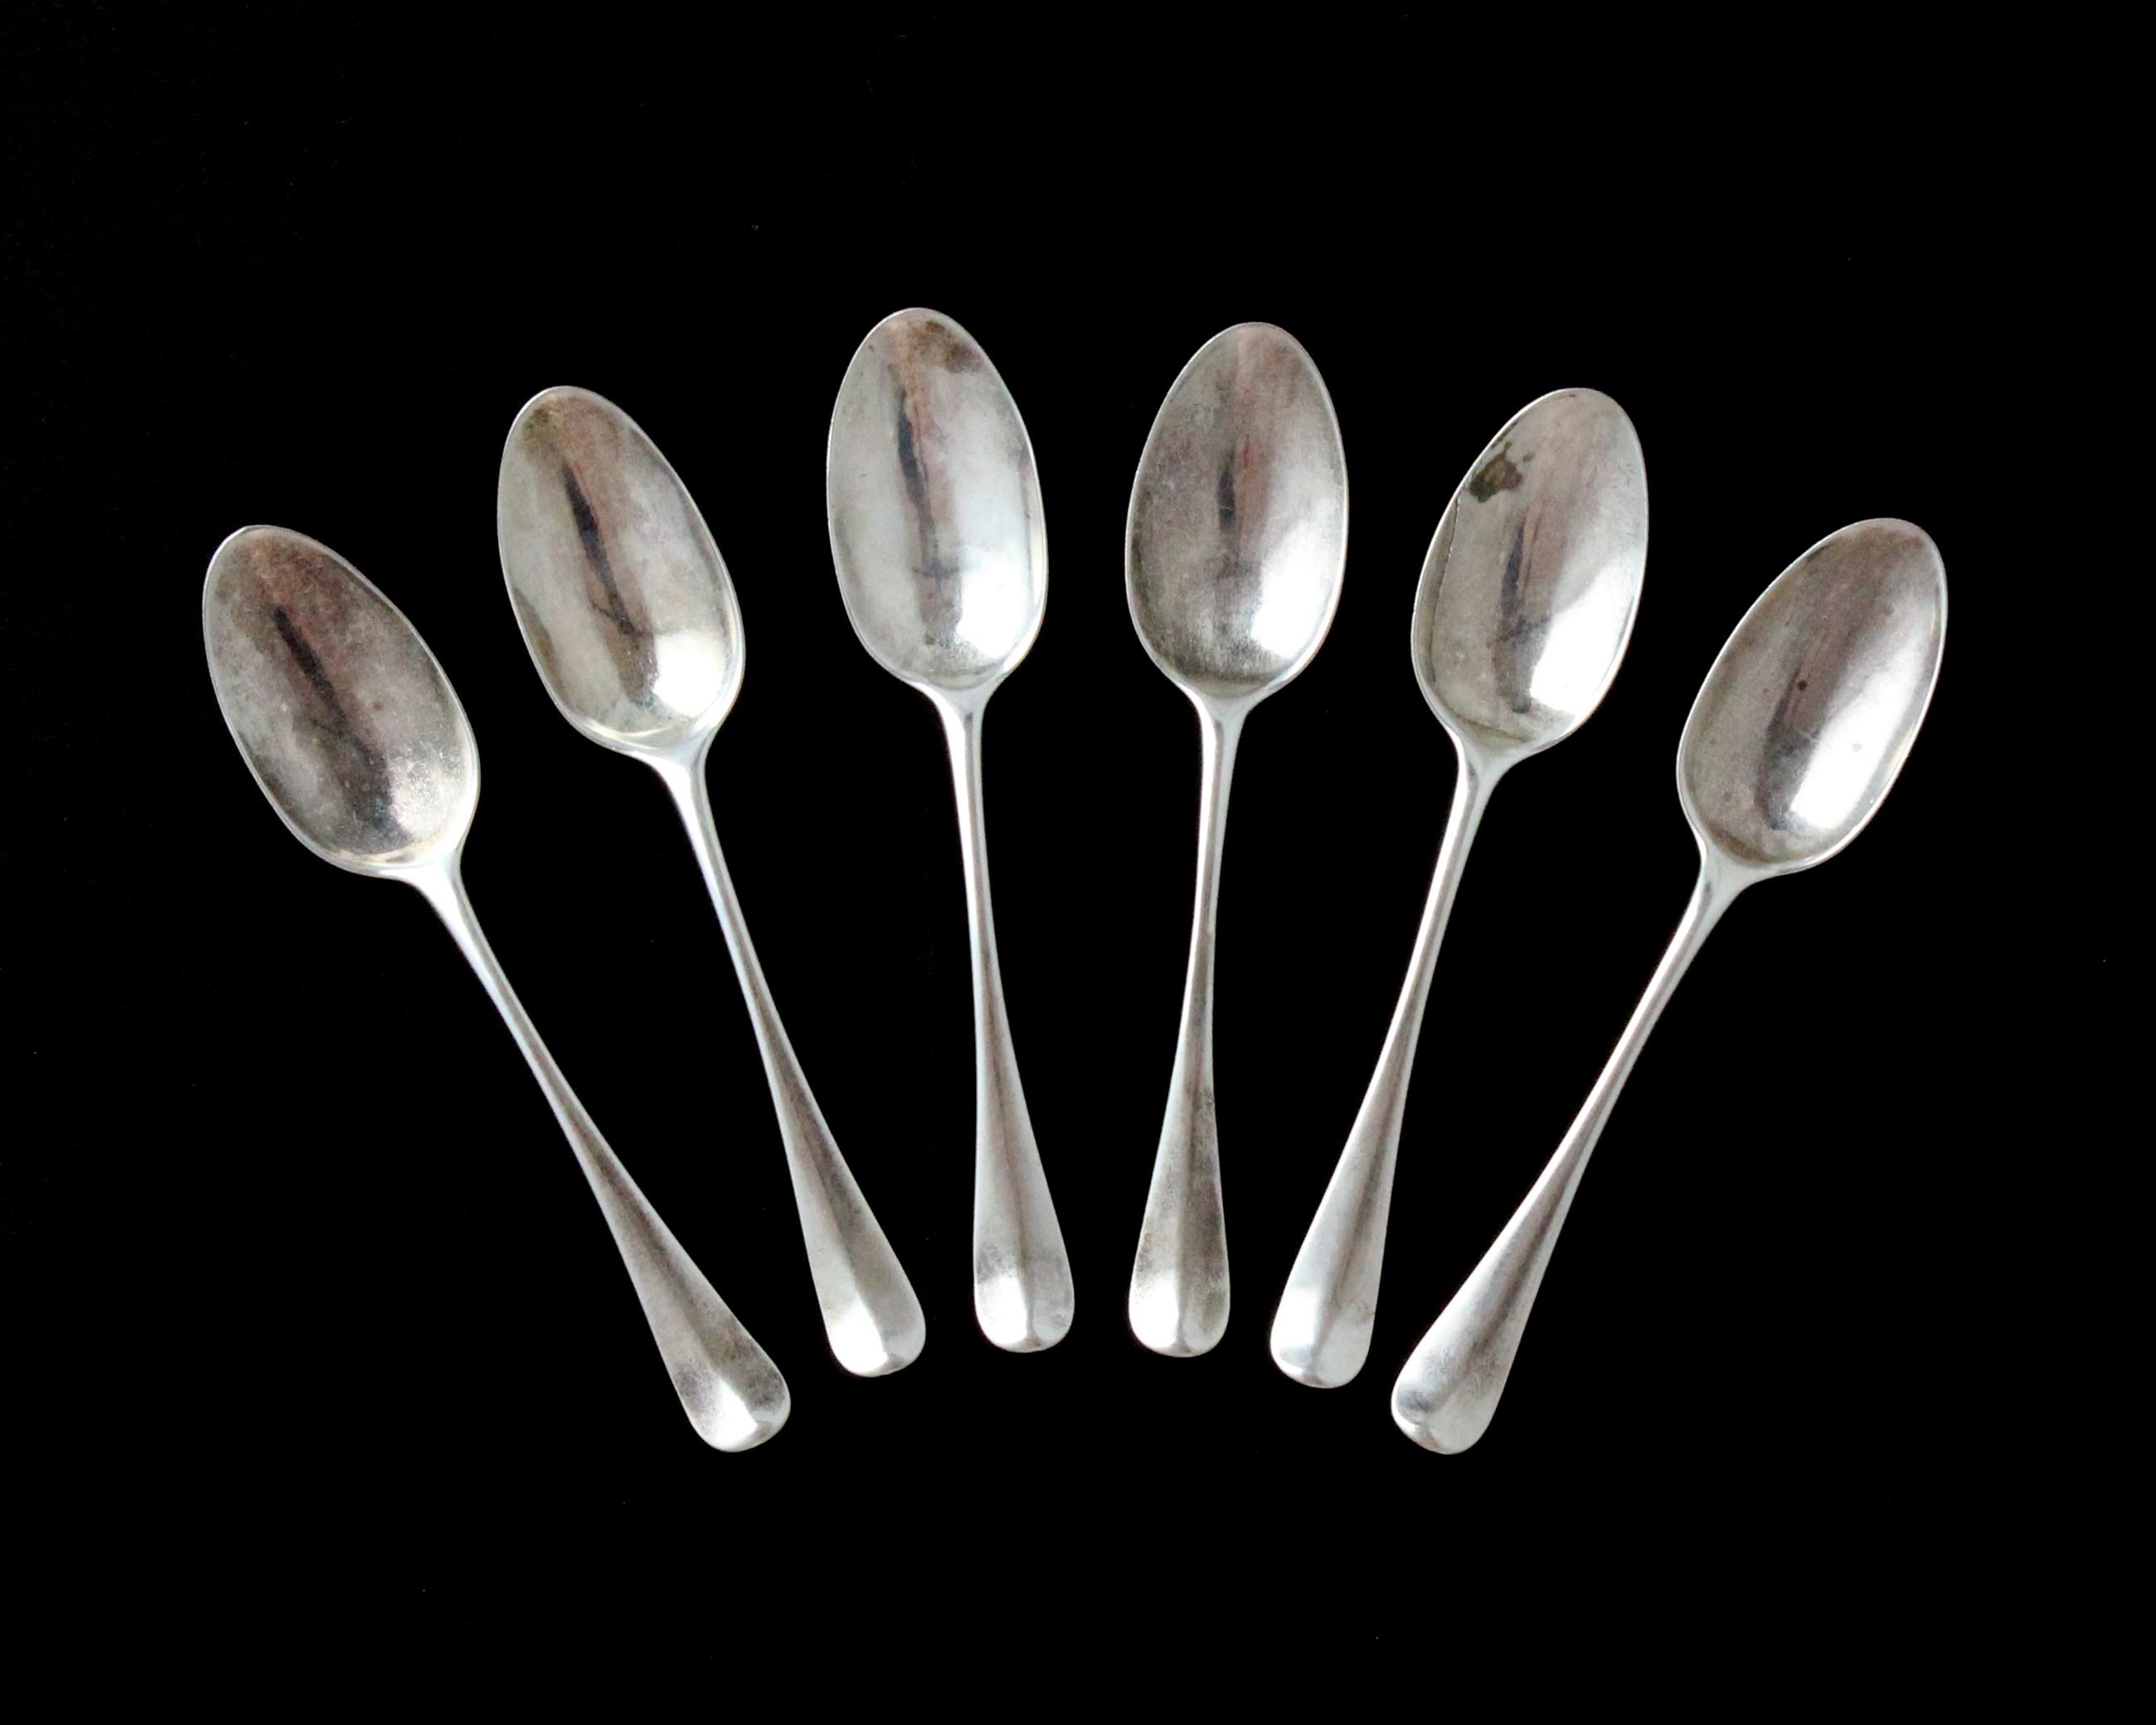 Los 4 - A set of six antique George II Sterling Silver dessert spoons by Philip Roker II, London 1730 in